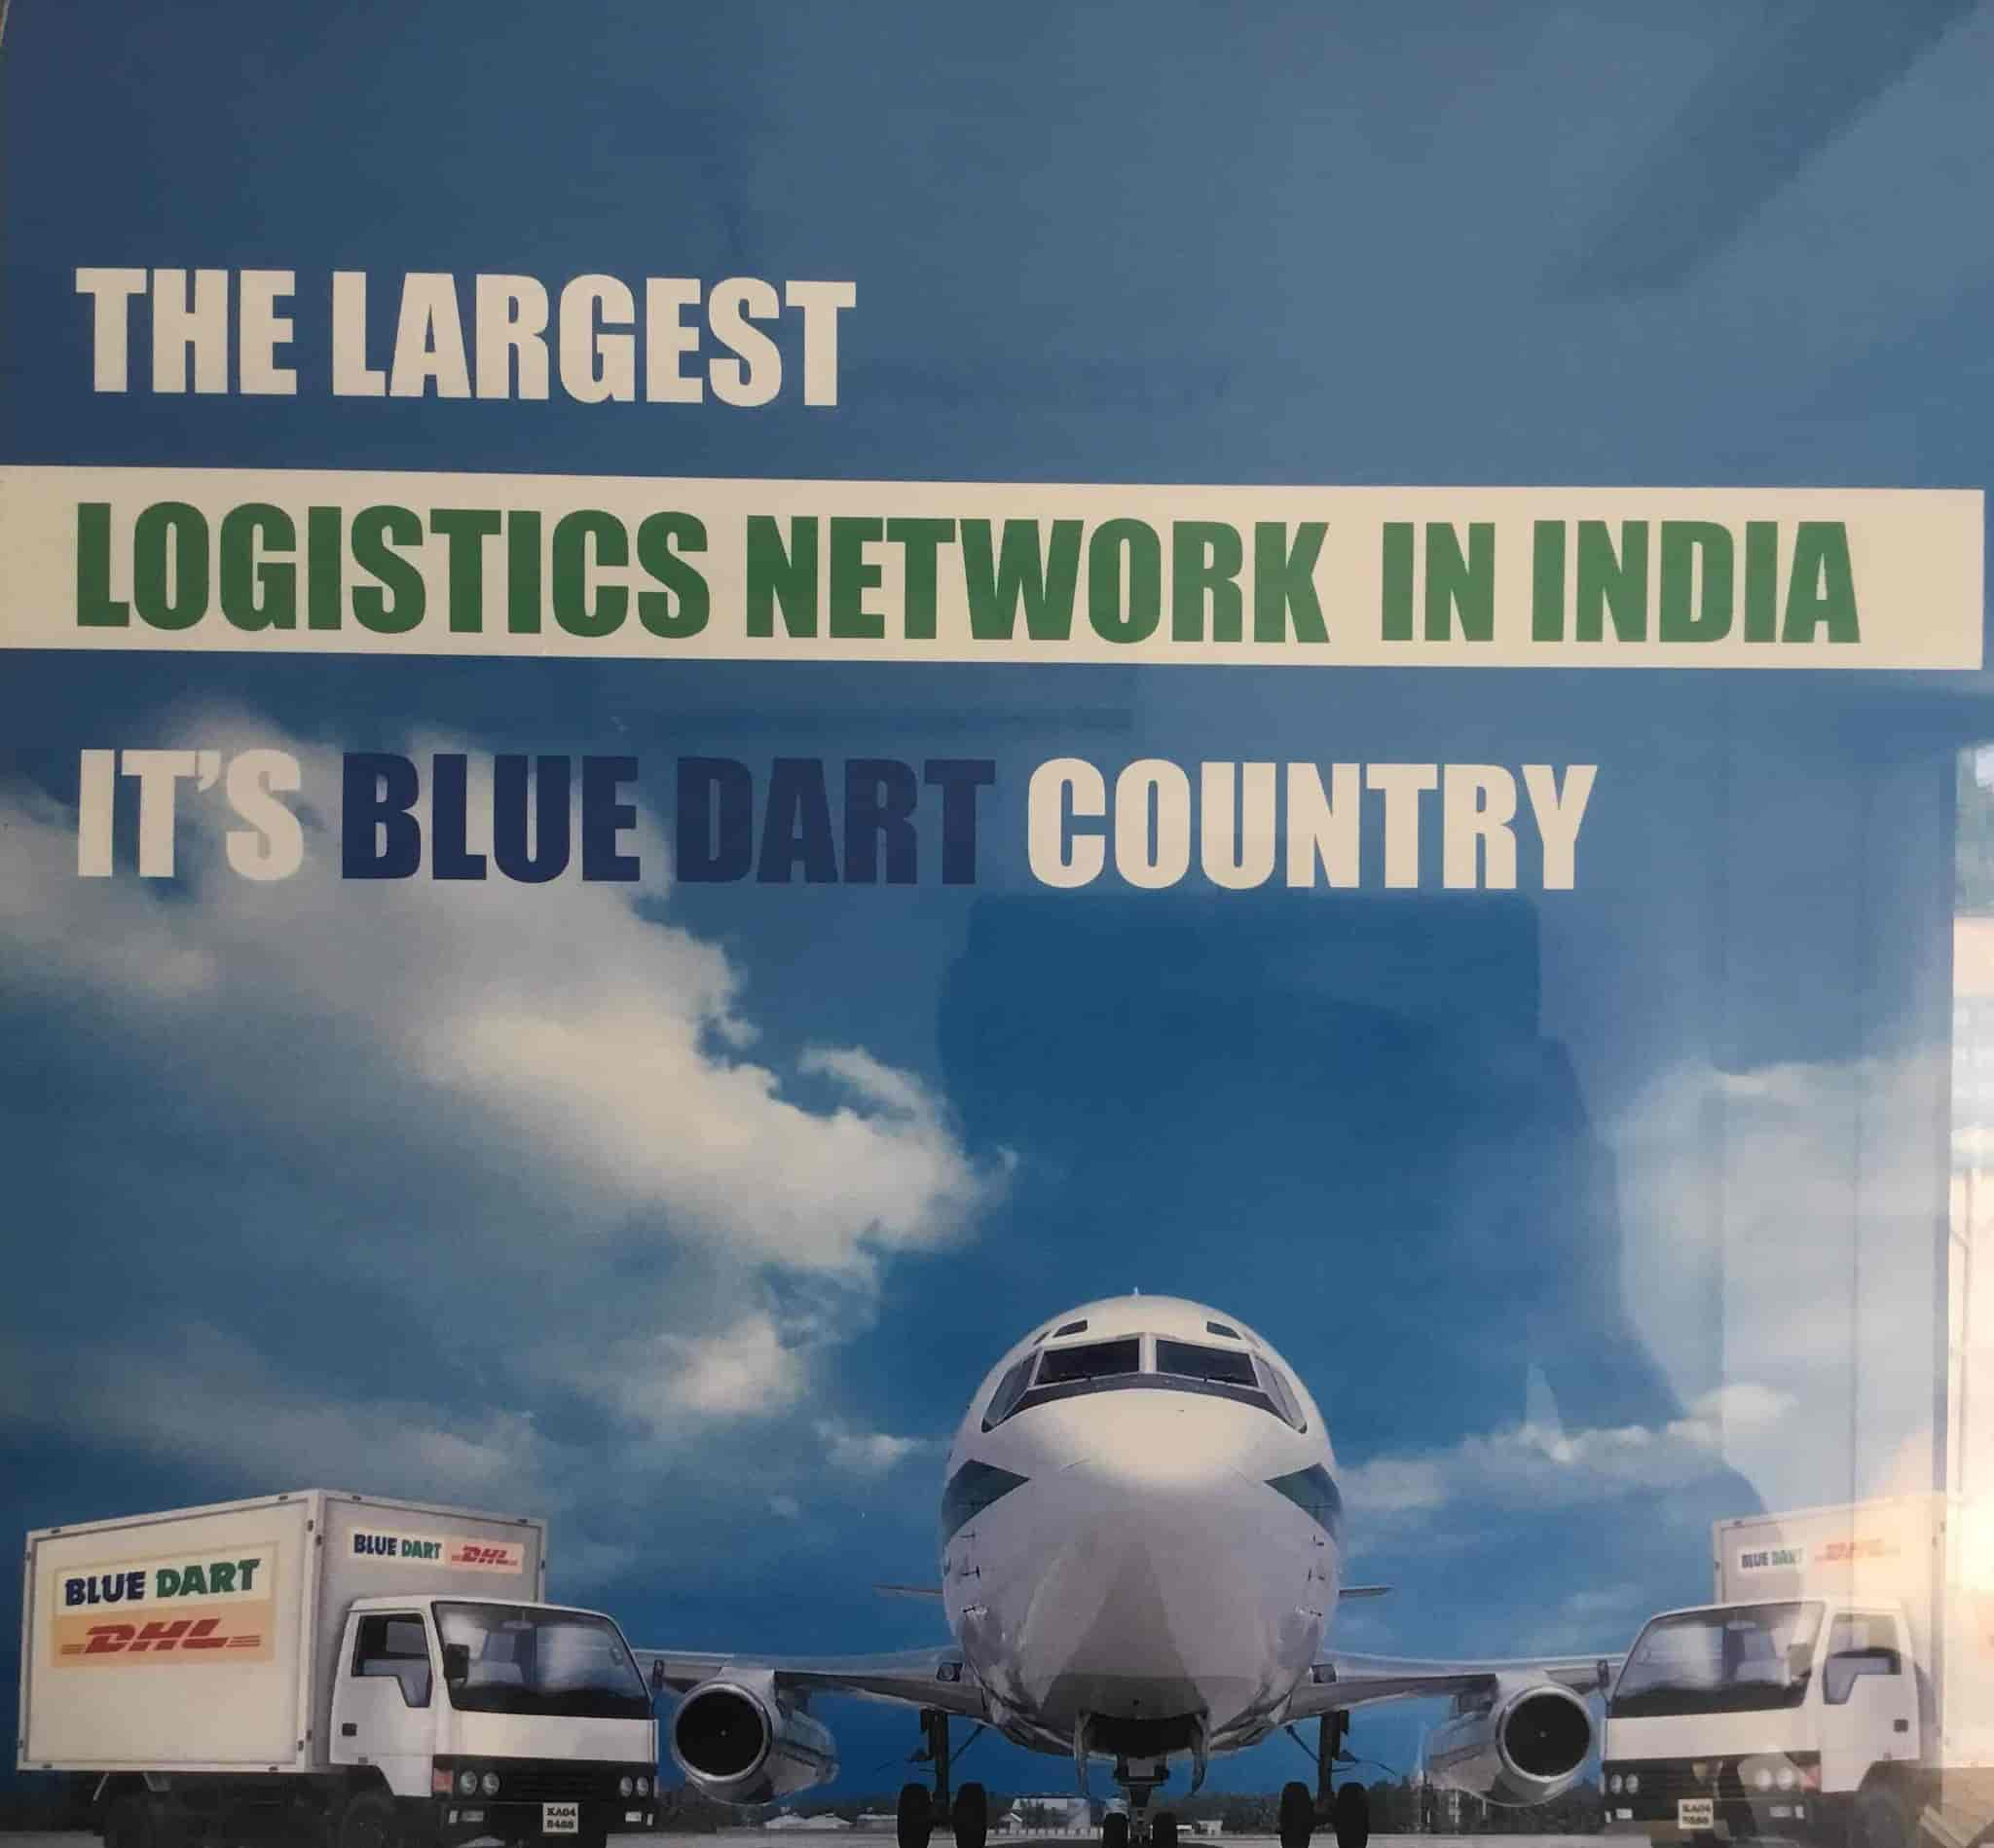 Blue Dart Express, Ayyanthole, Thrissur - Domestic & international